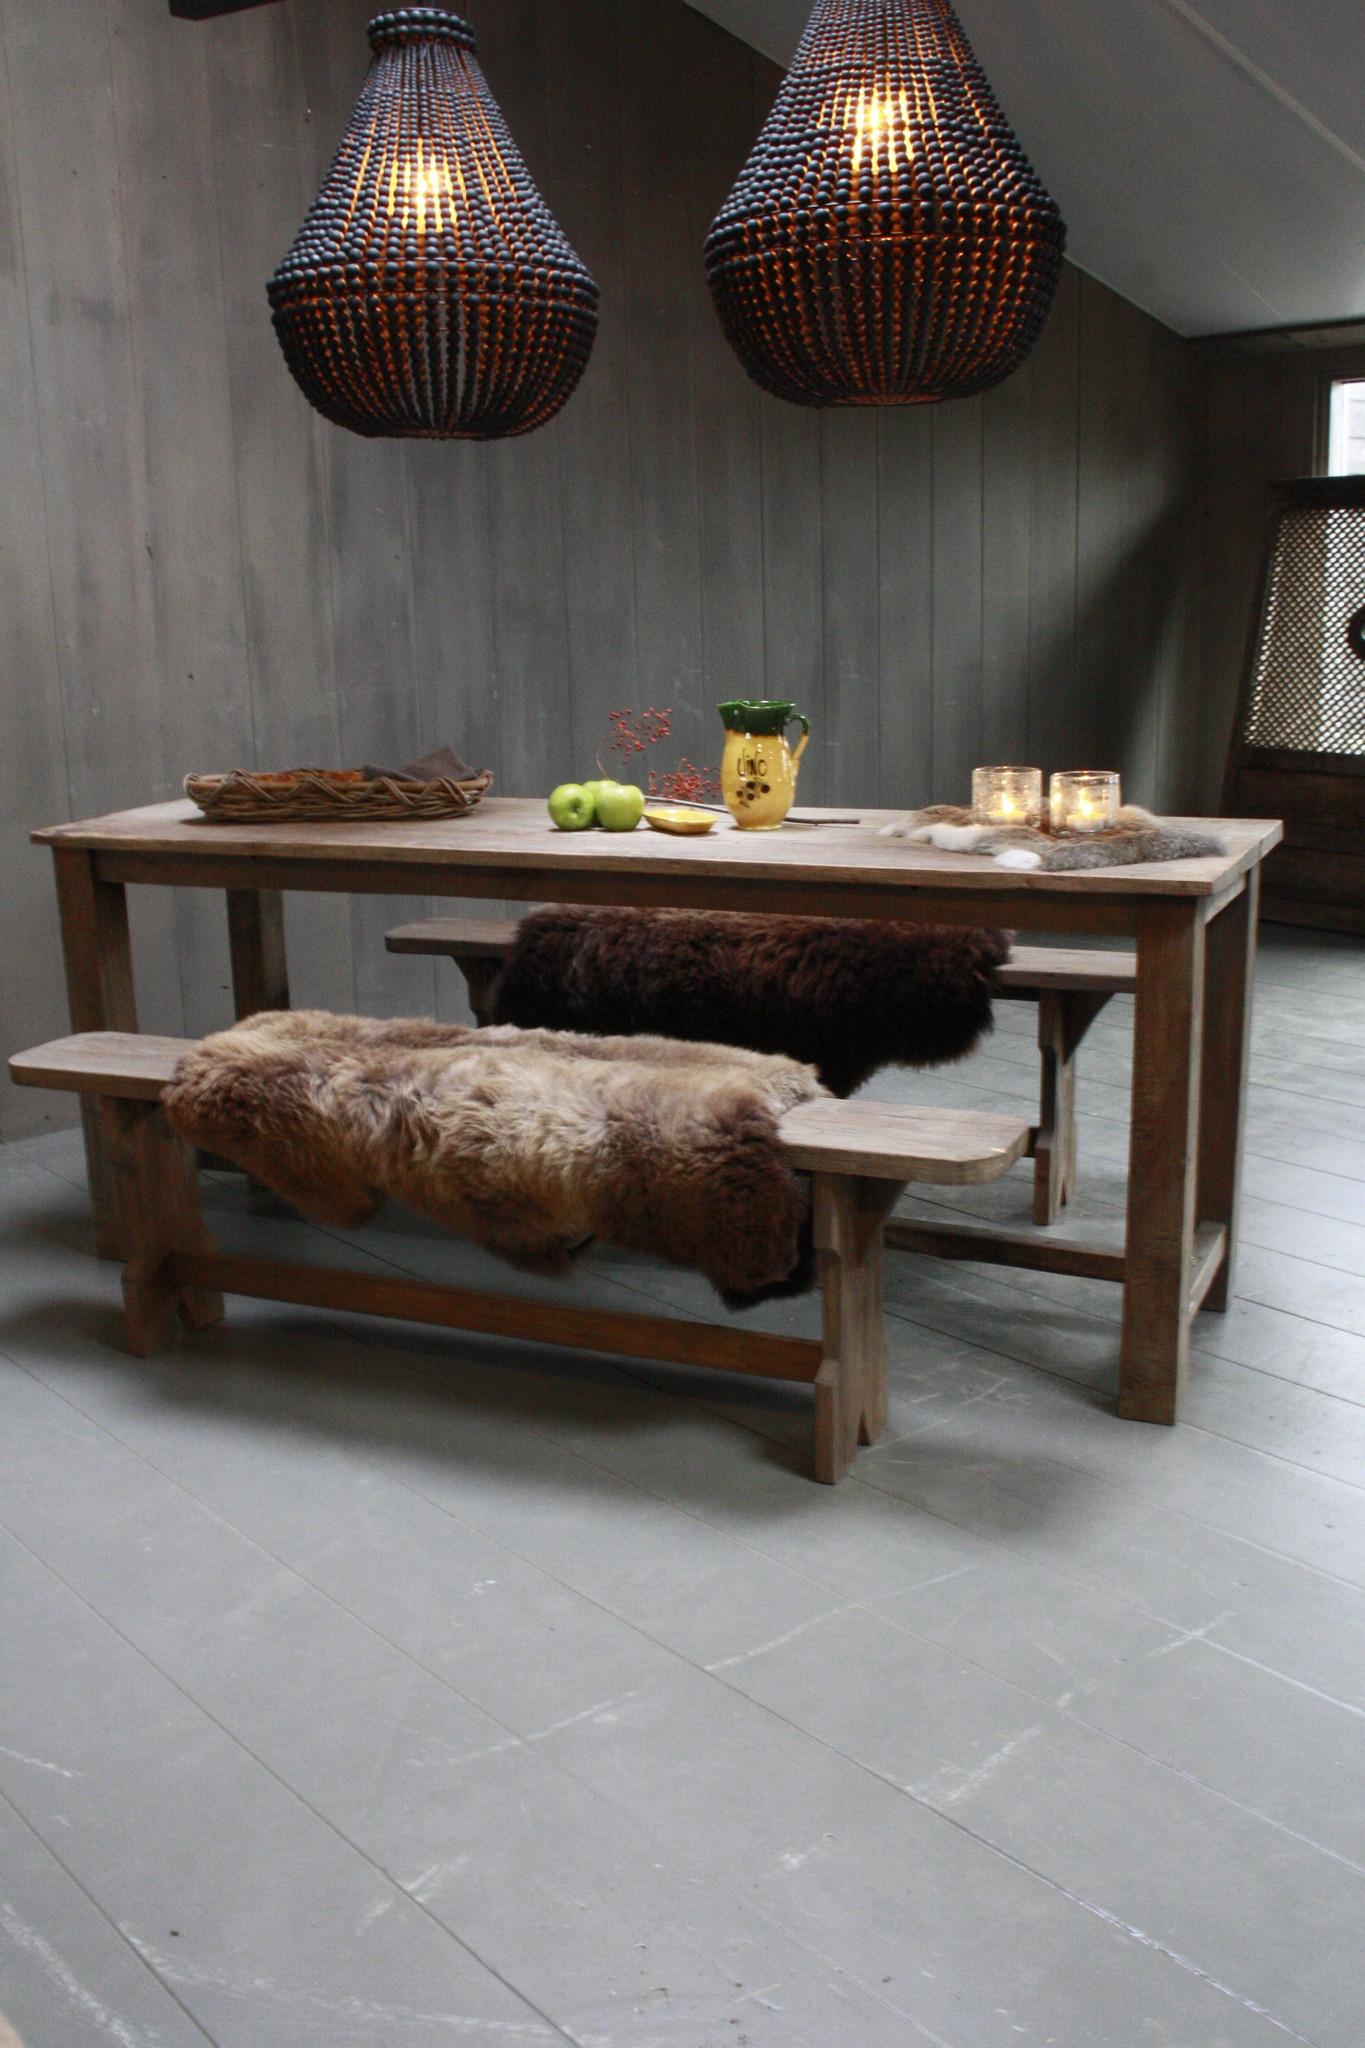 Oud houten eetkamer set met 2 houten bankjes-1